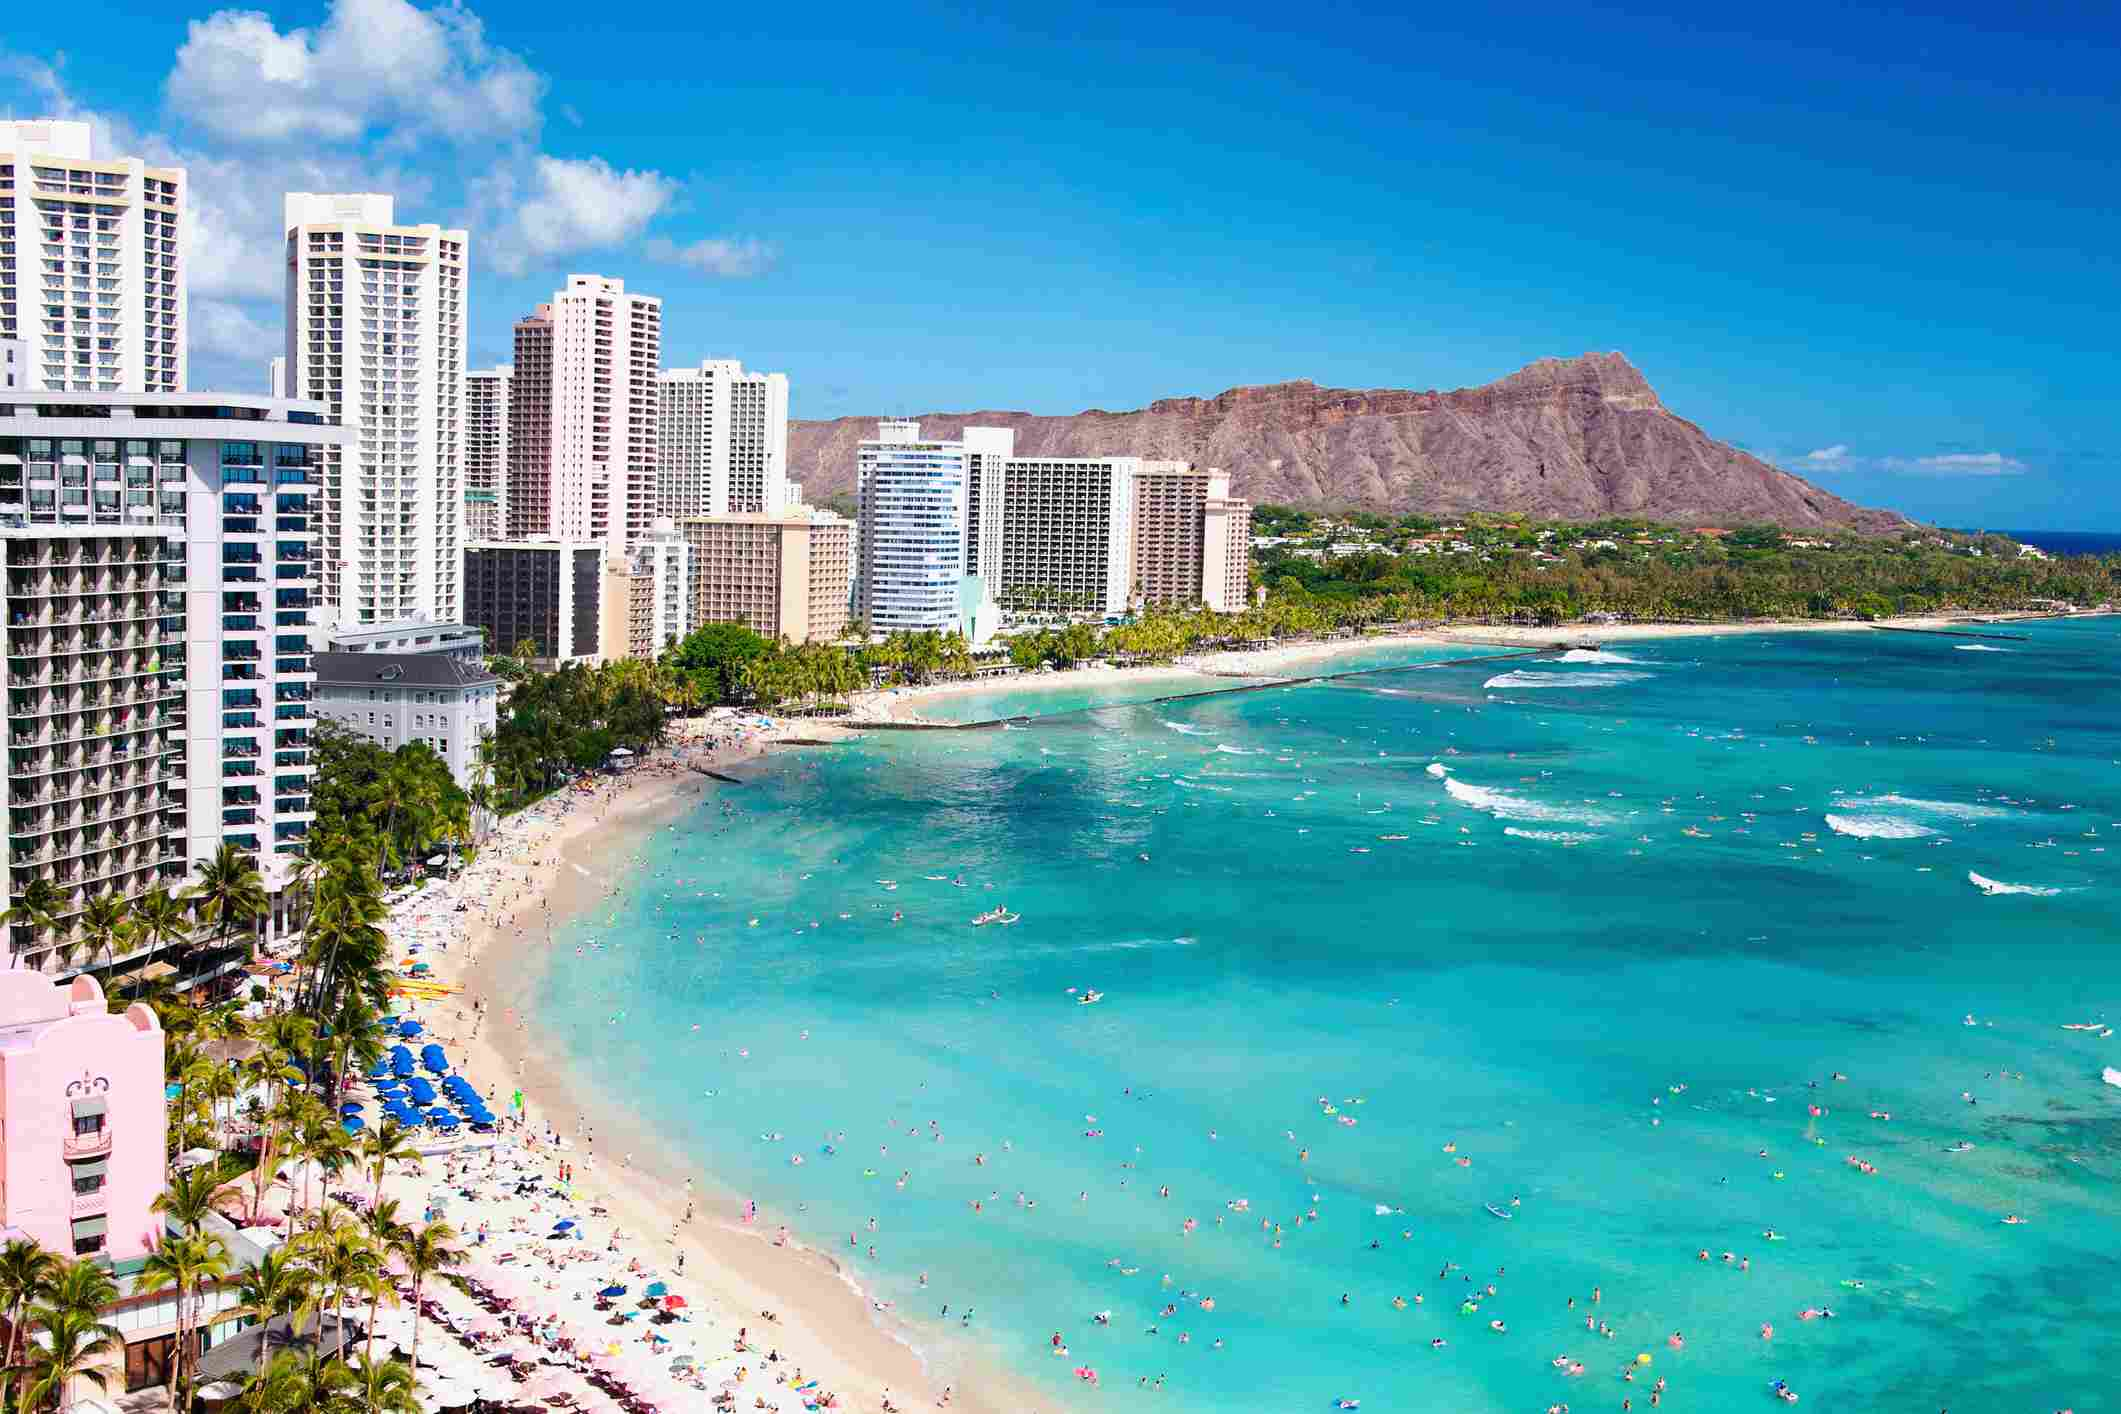 Hilton Hotels Resorts In Hawaii